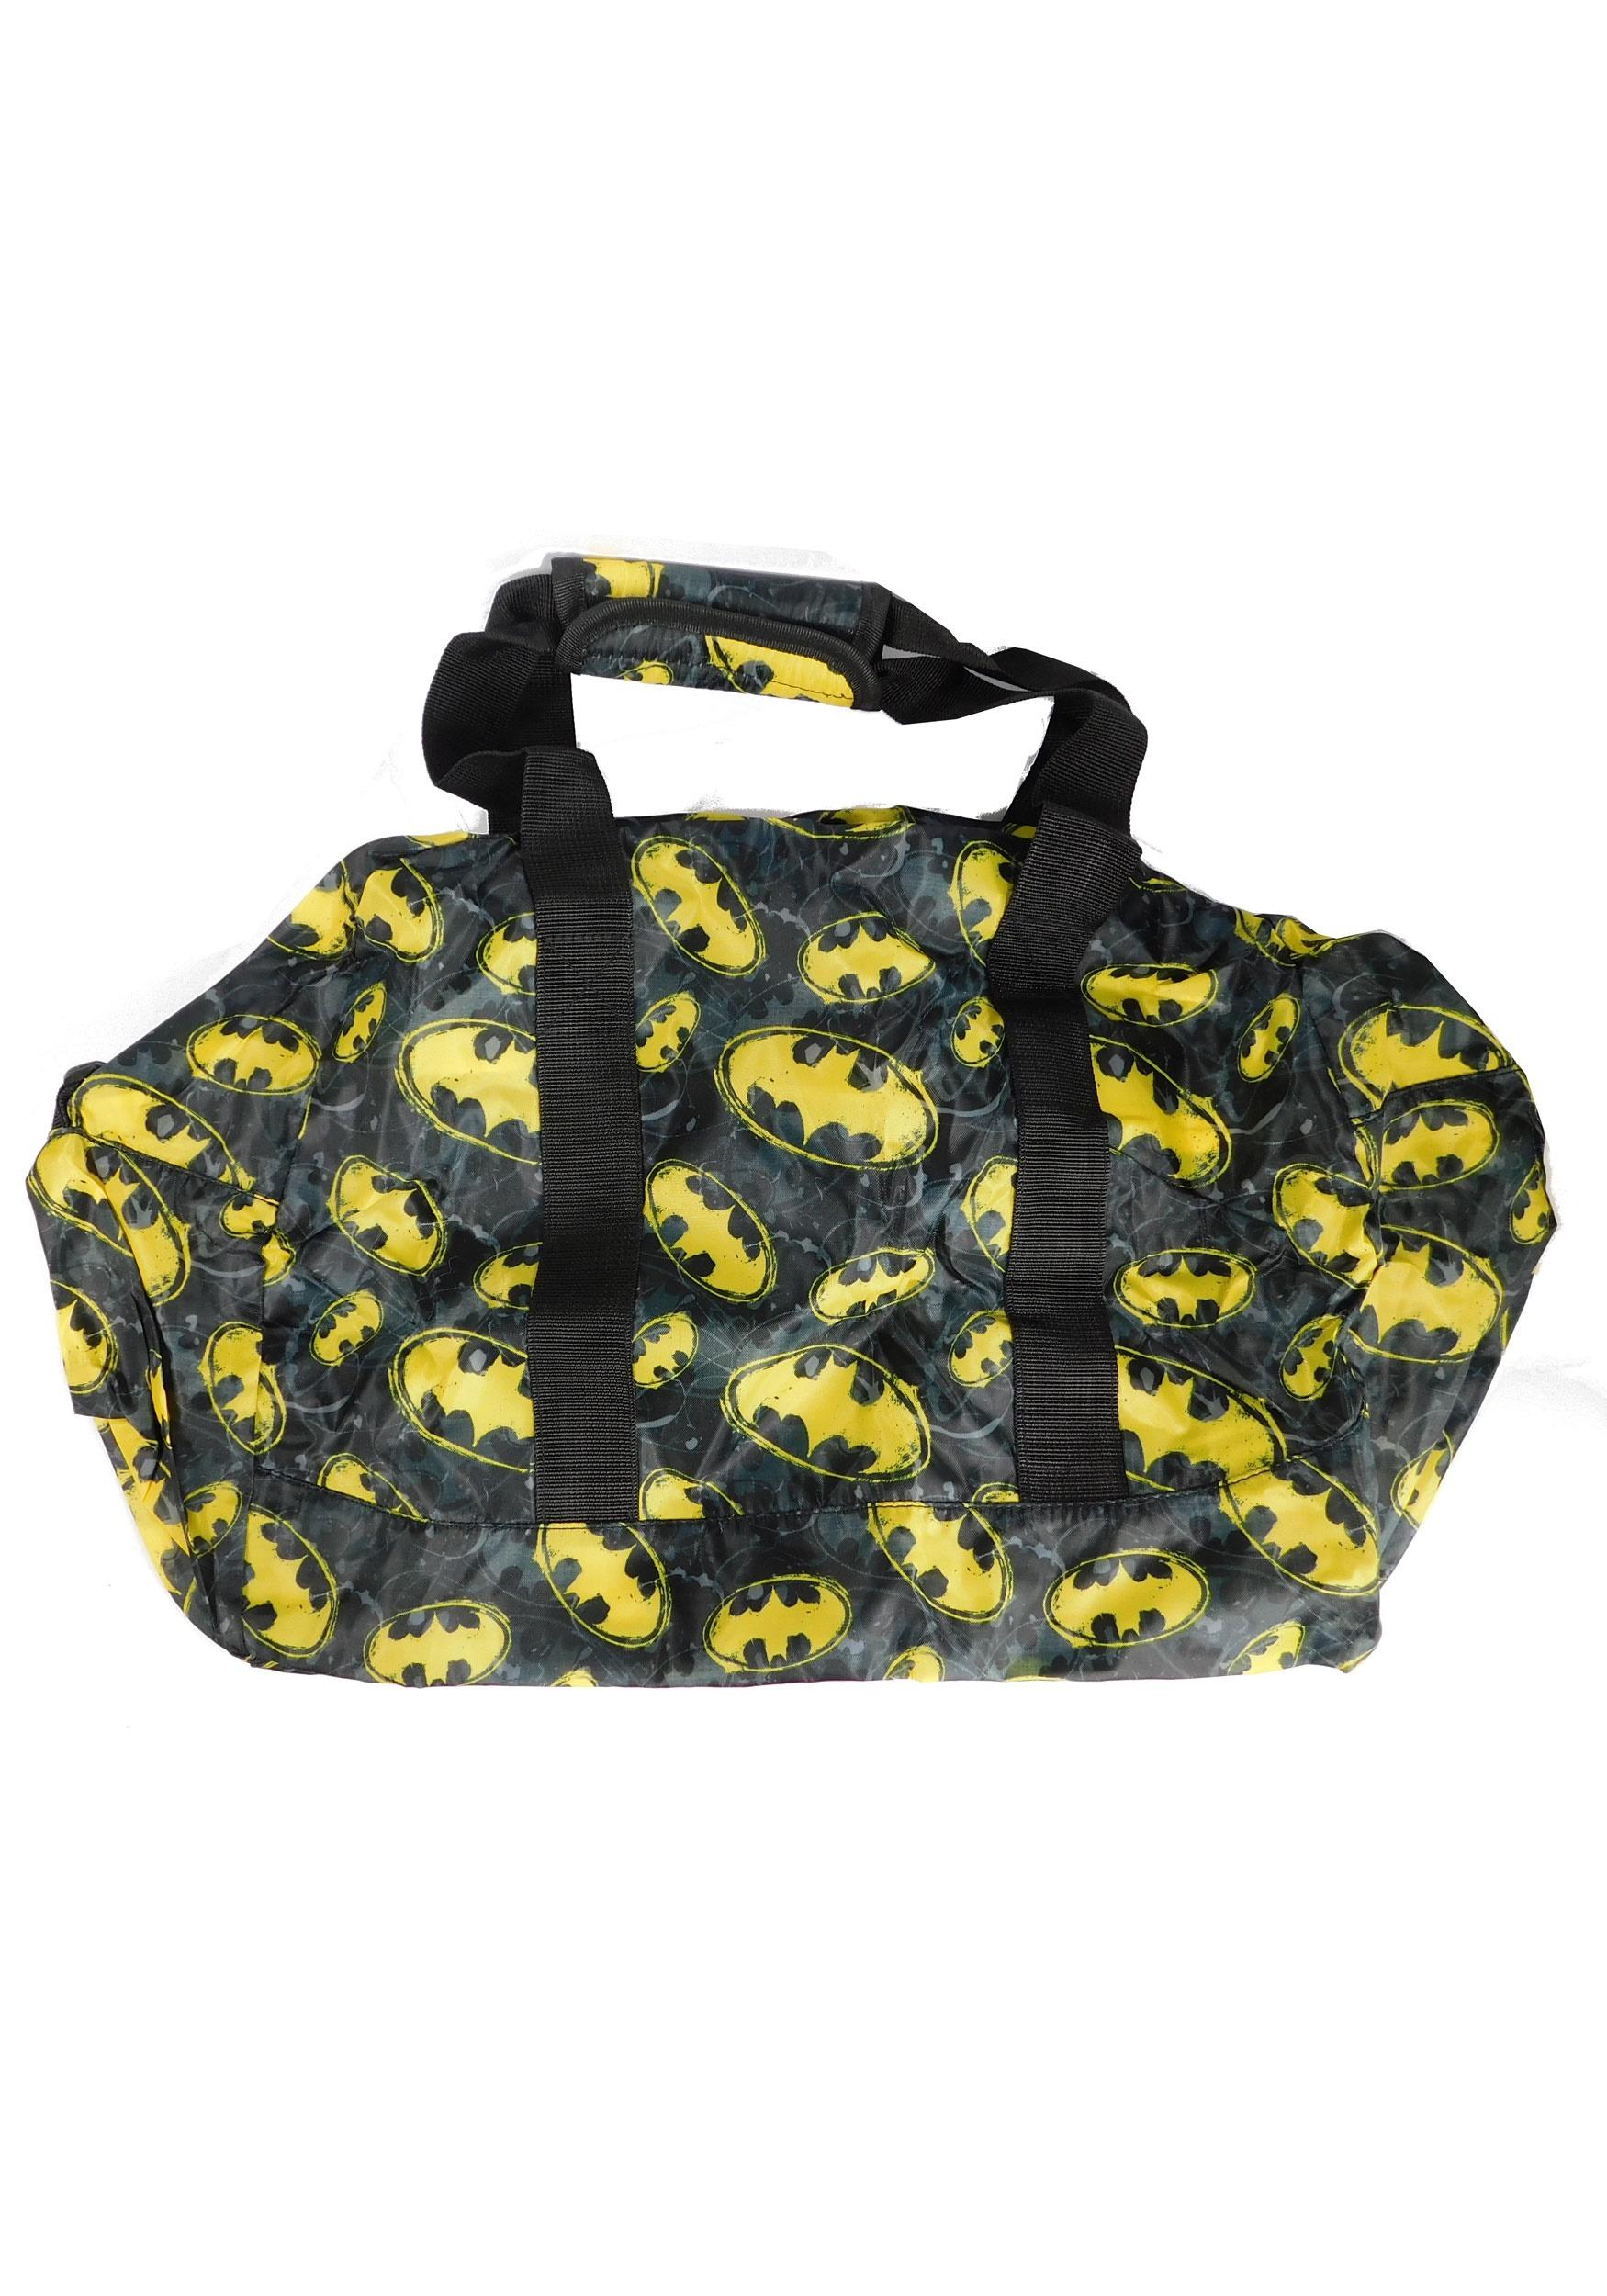 Packaway_Duffle_Batman_Bag